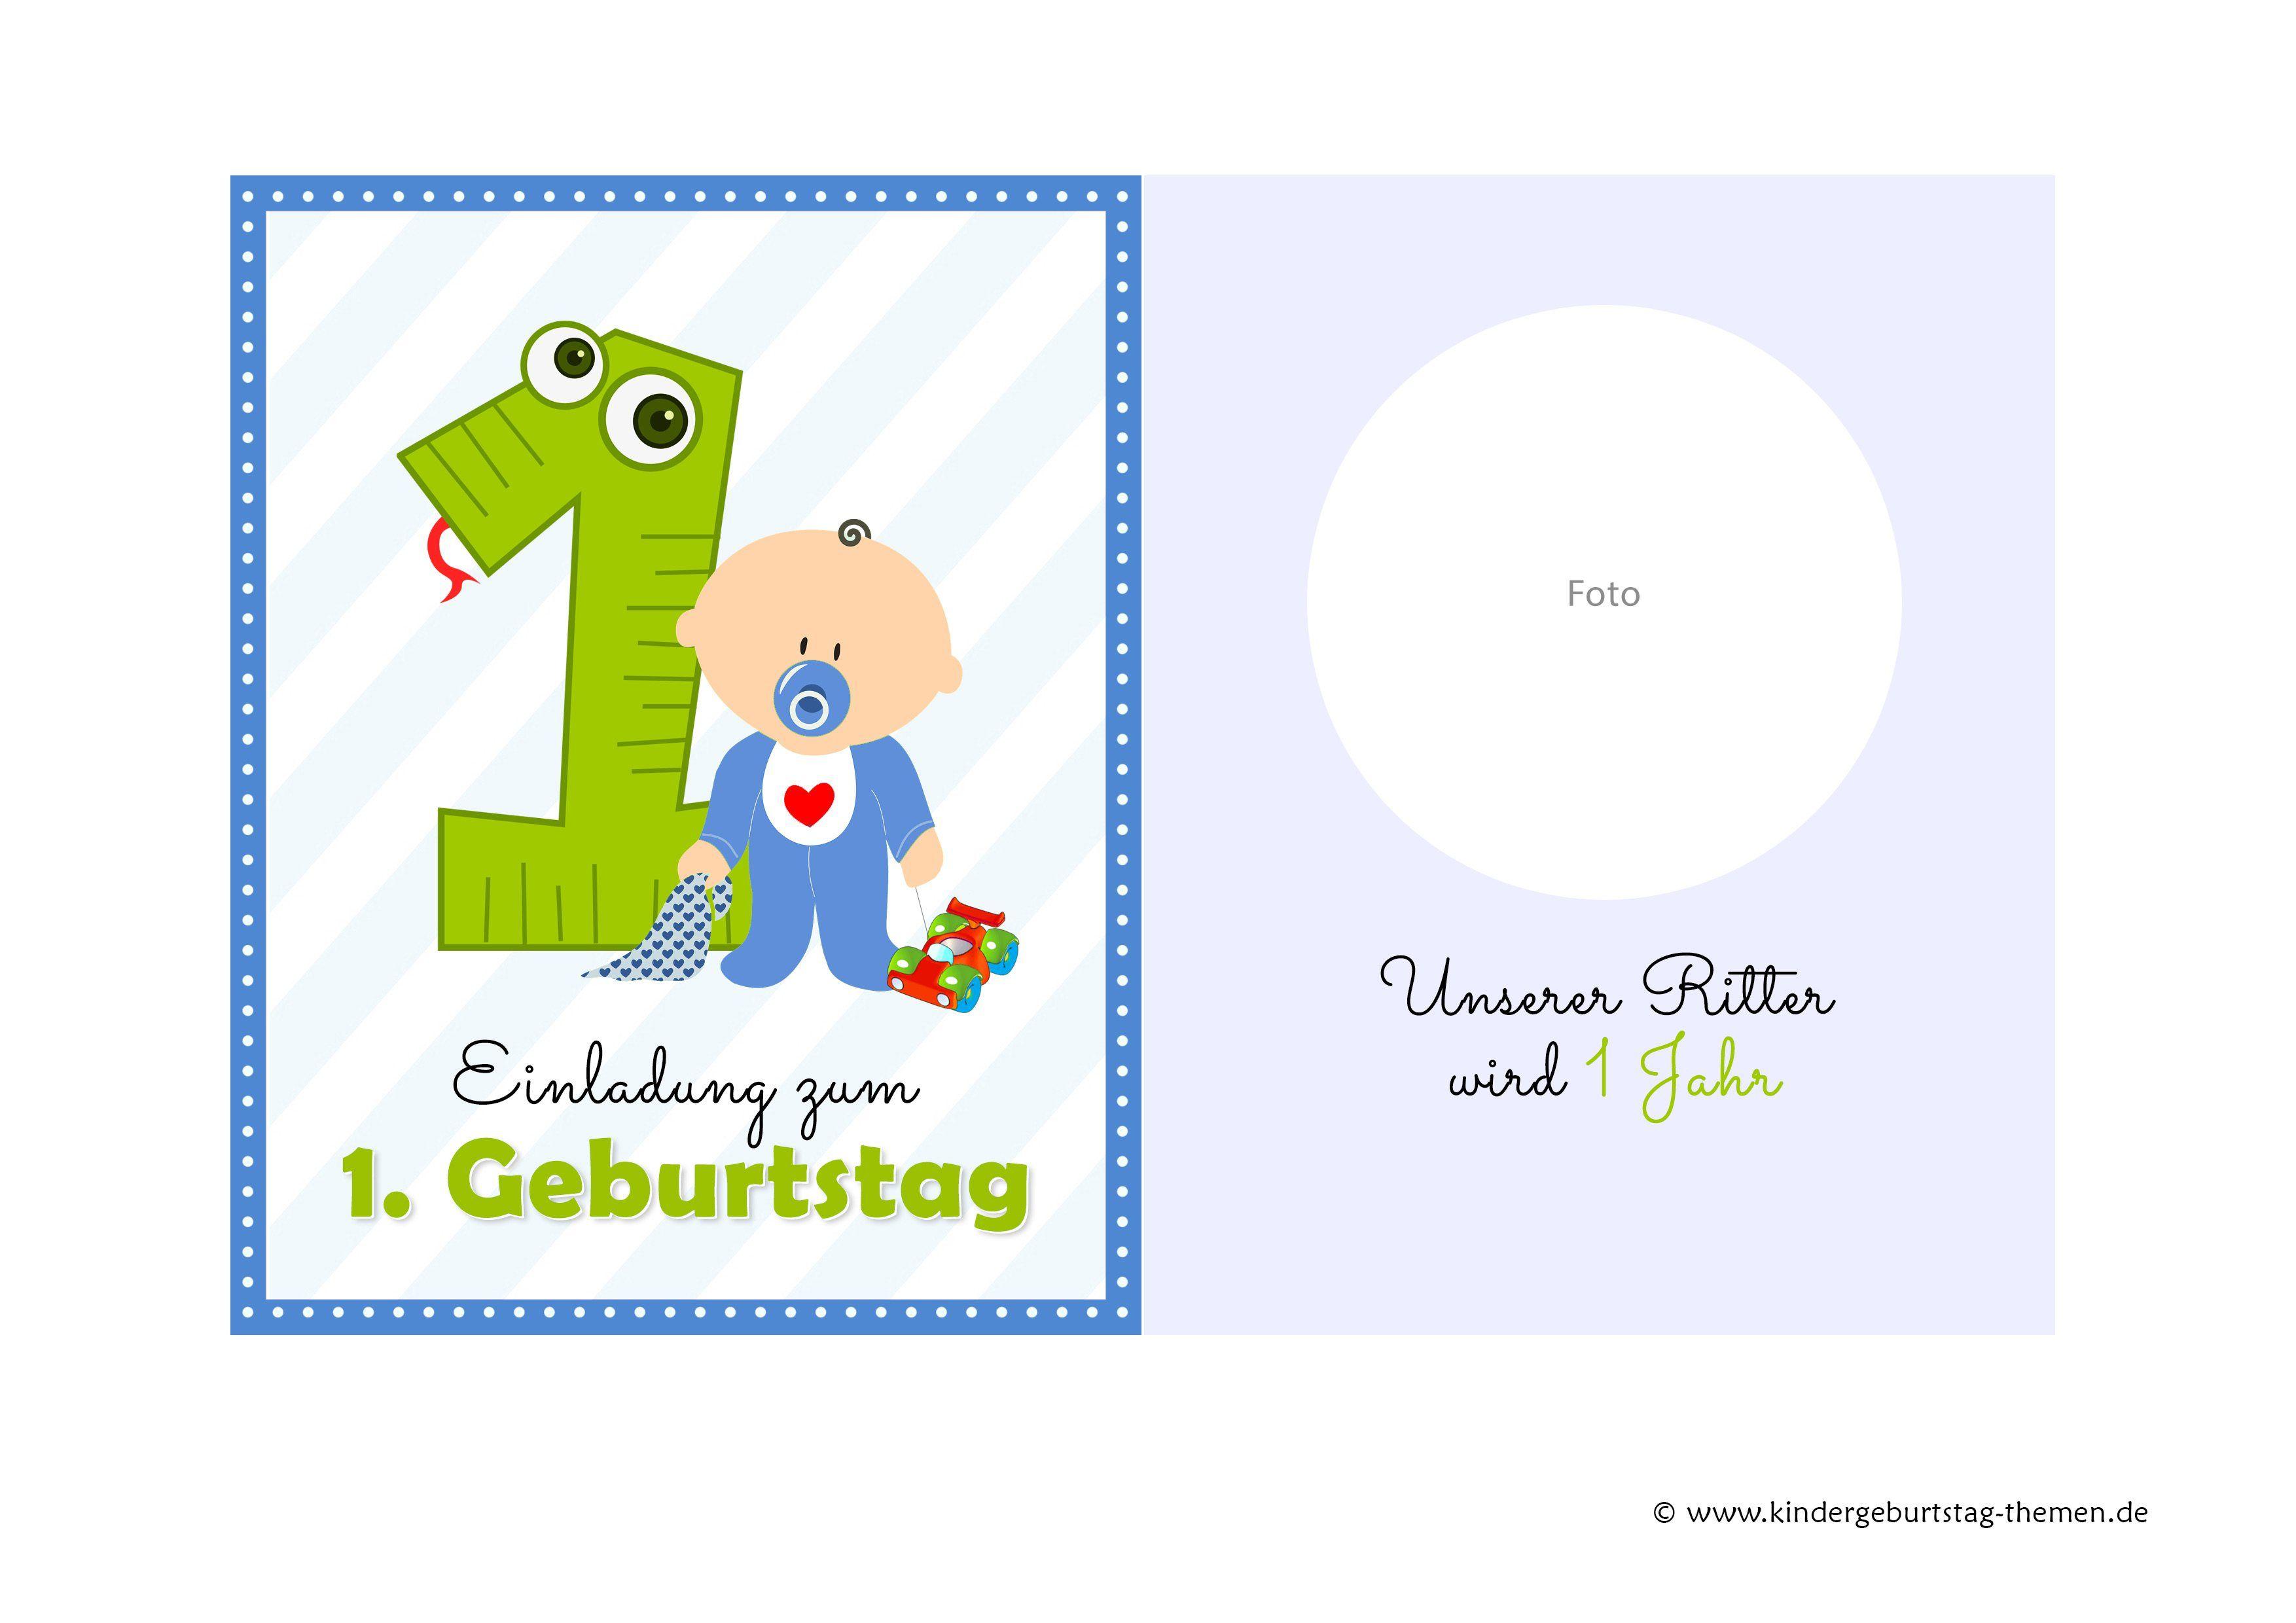 Einladung Geburtstag : Einladung 1 Geburtstag   Geburstag Einladungskarten    Geburstag Einladungskarten